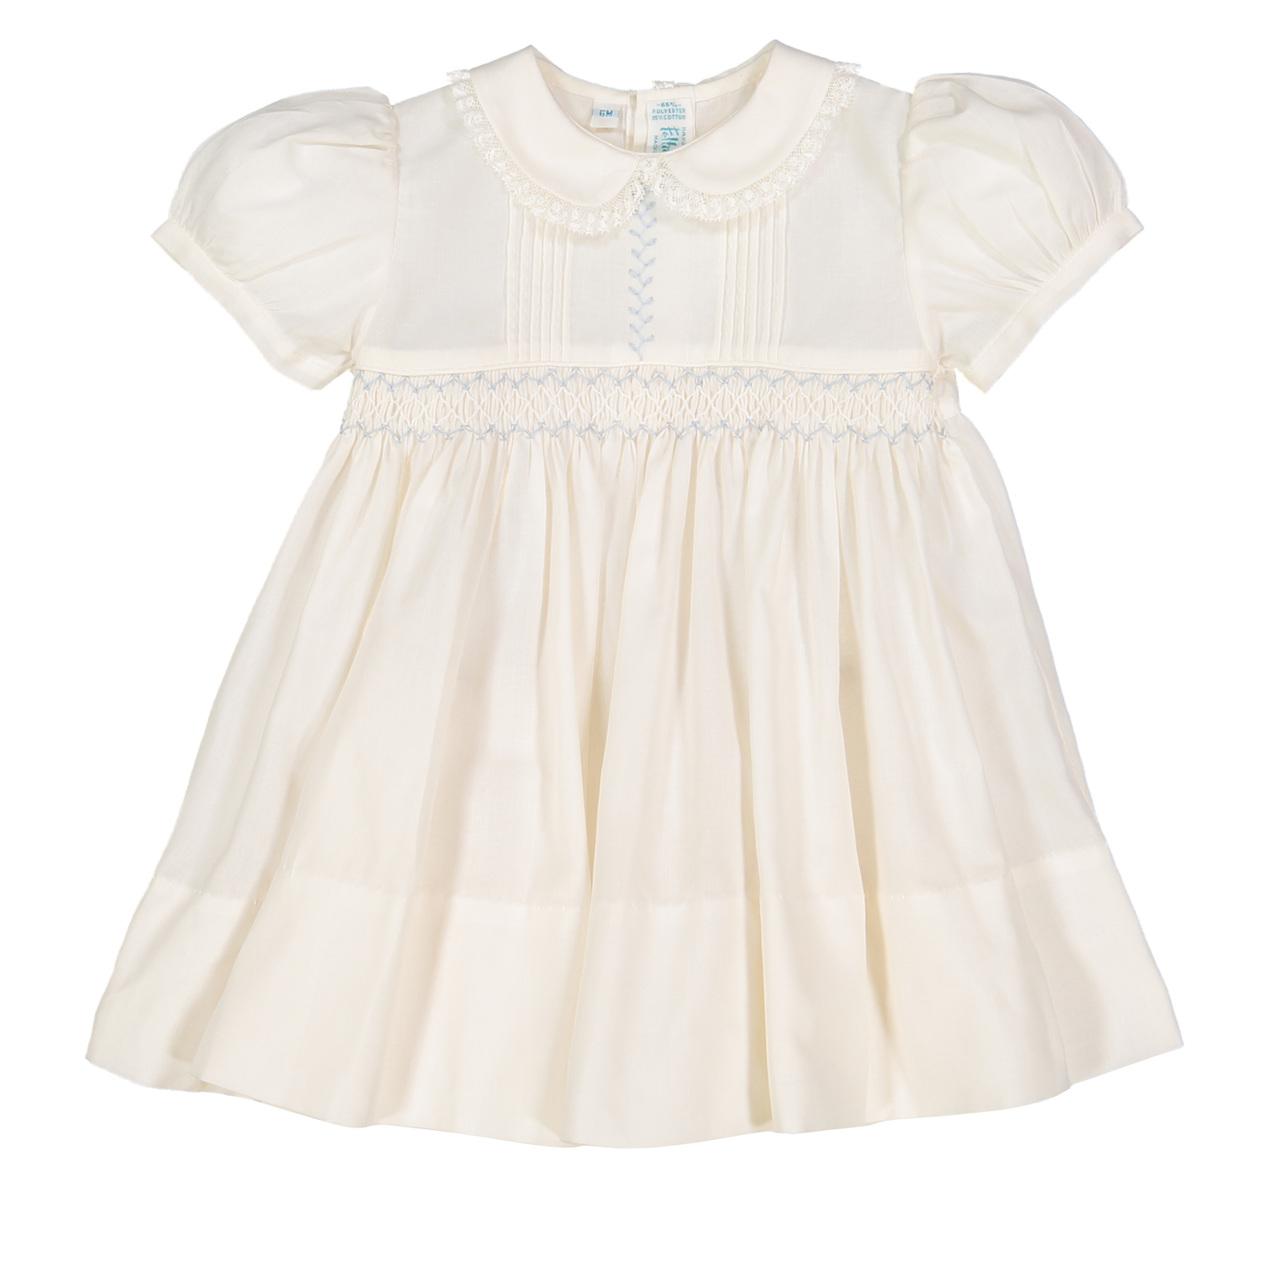 9m,12m,18m,24m,2T,3T,4T White Smocked Dress